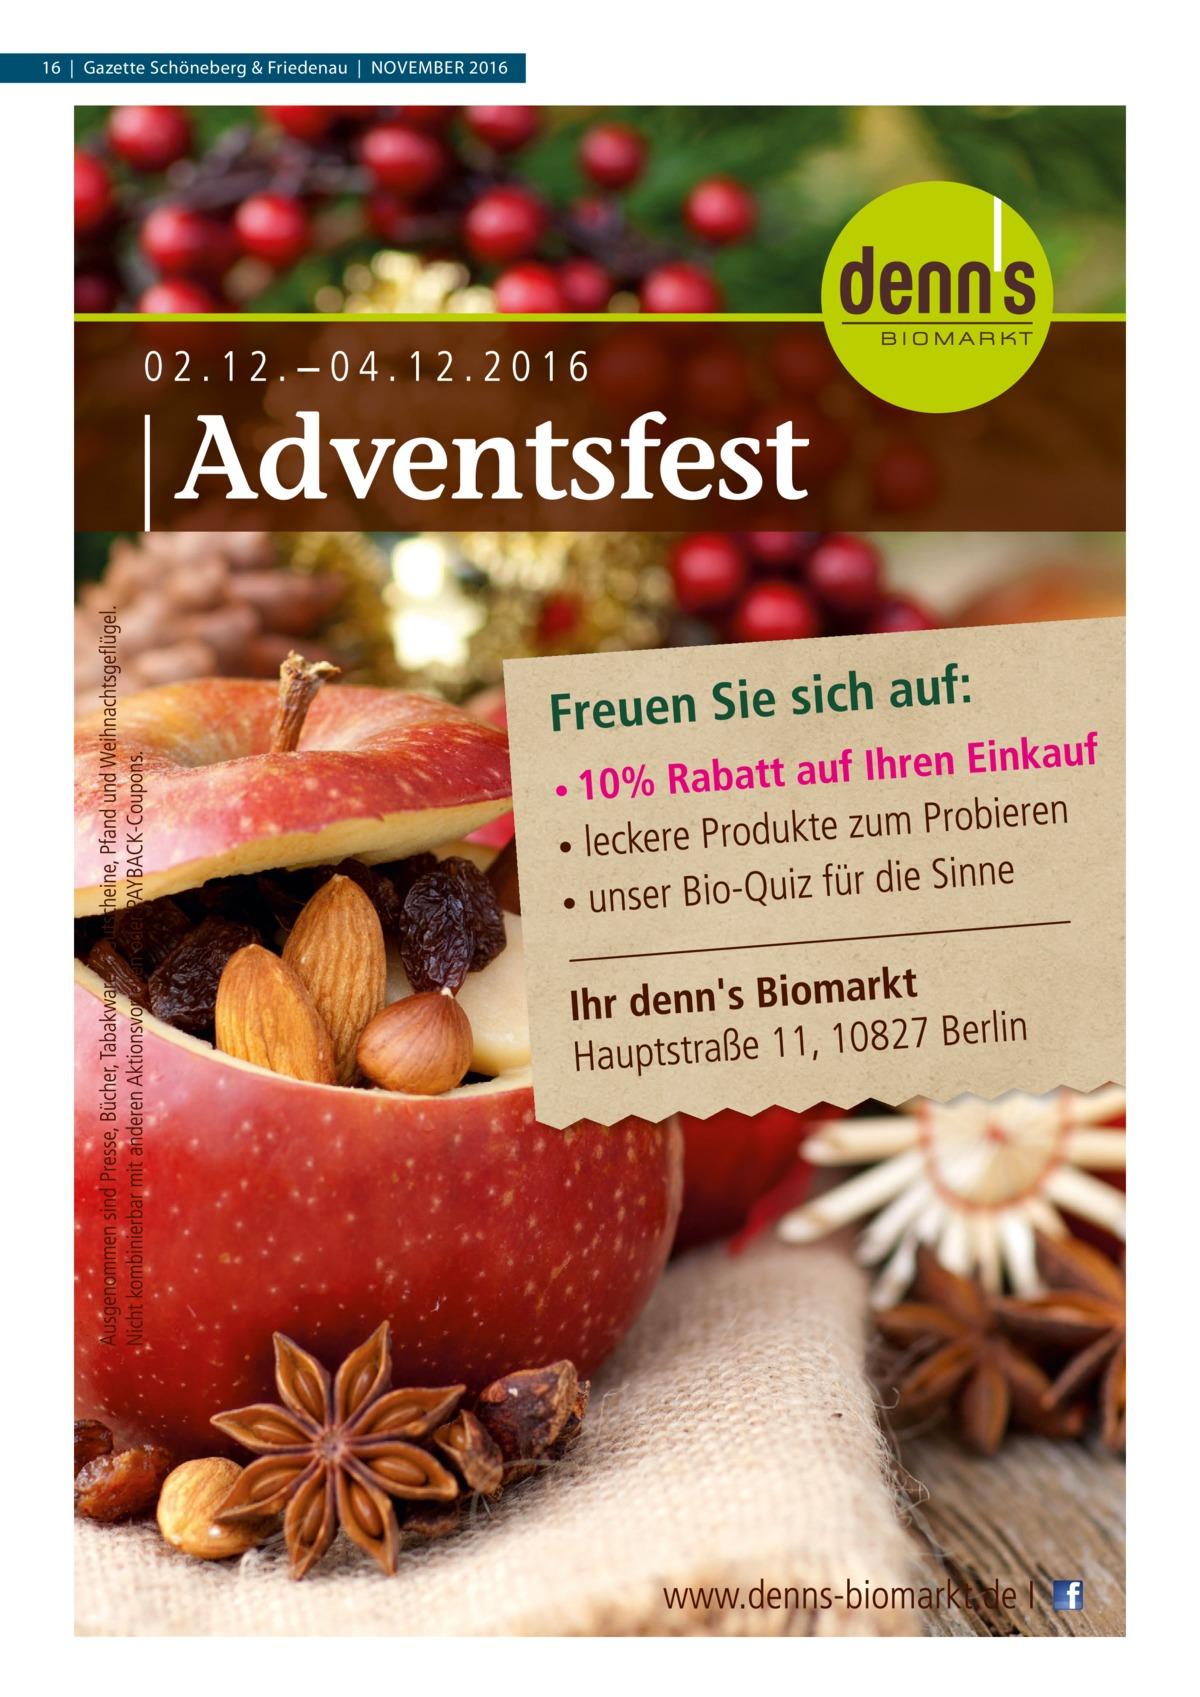 16|Gazette Schöneberg & Friedenau|November 2016